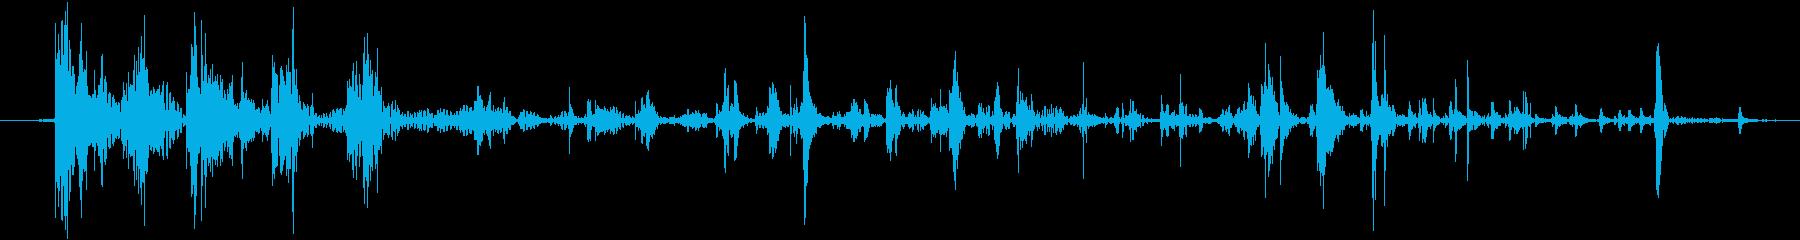 SHORT JUICY SQUIR...の再生済みの波形